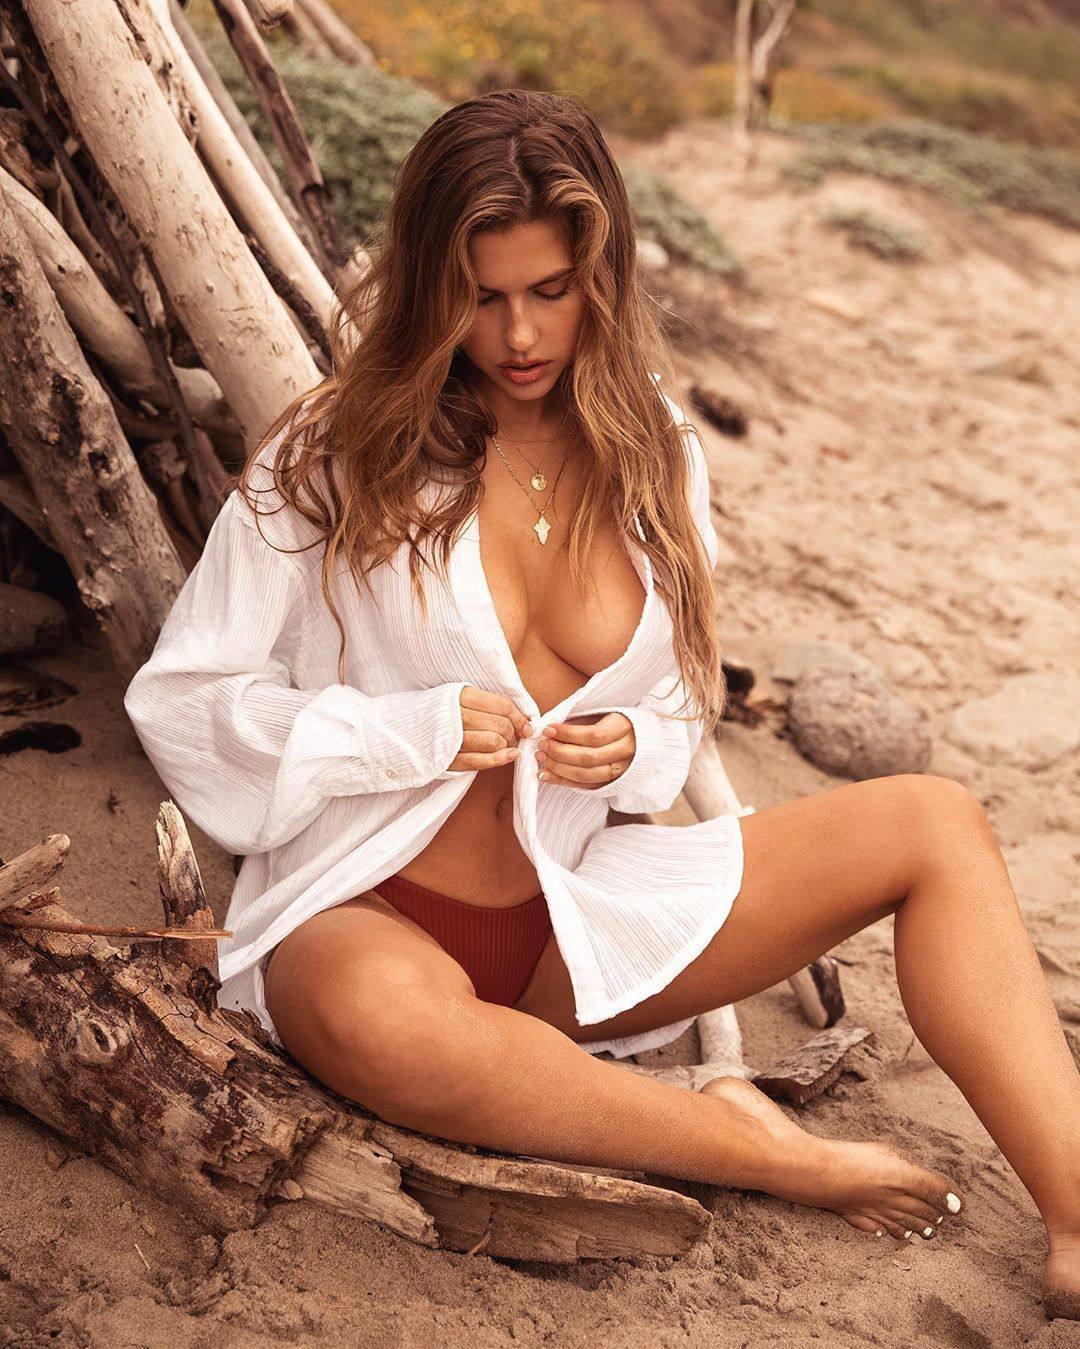 Kara Del Toro Braless Breasts